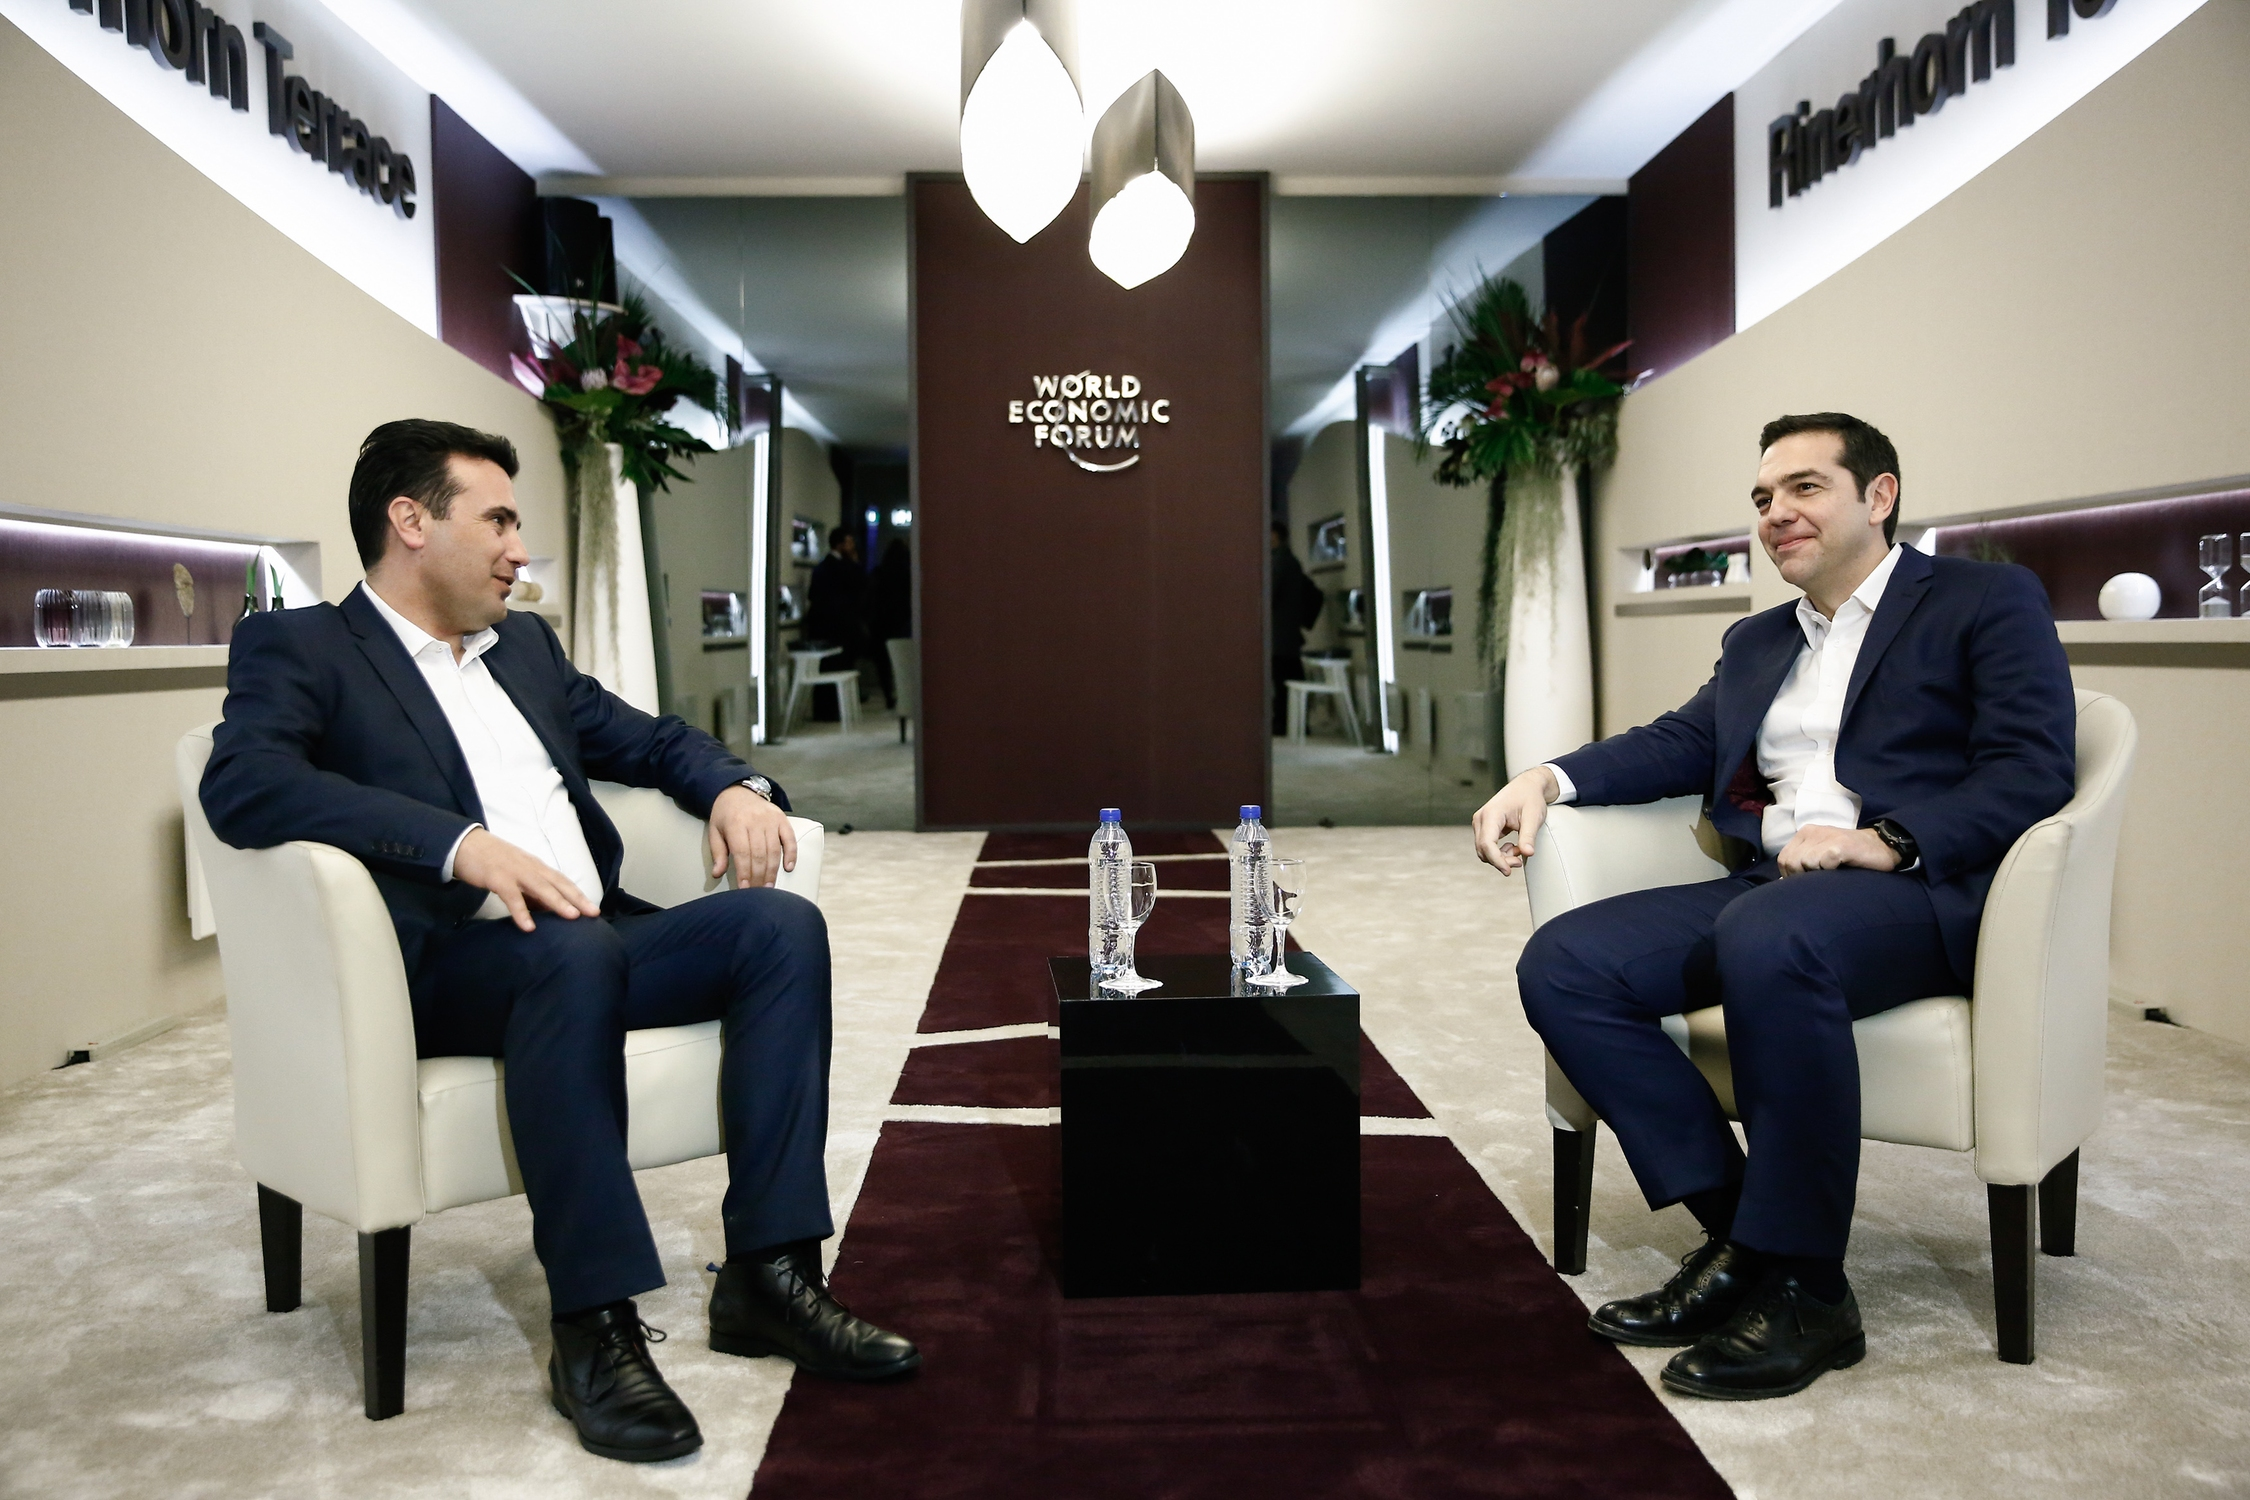 Yannis Kolesidis / PM Handout / SOOC